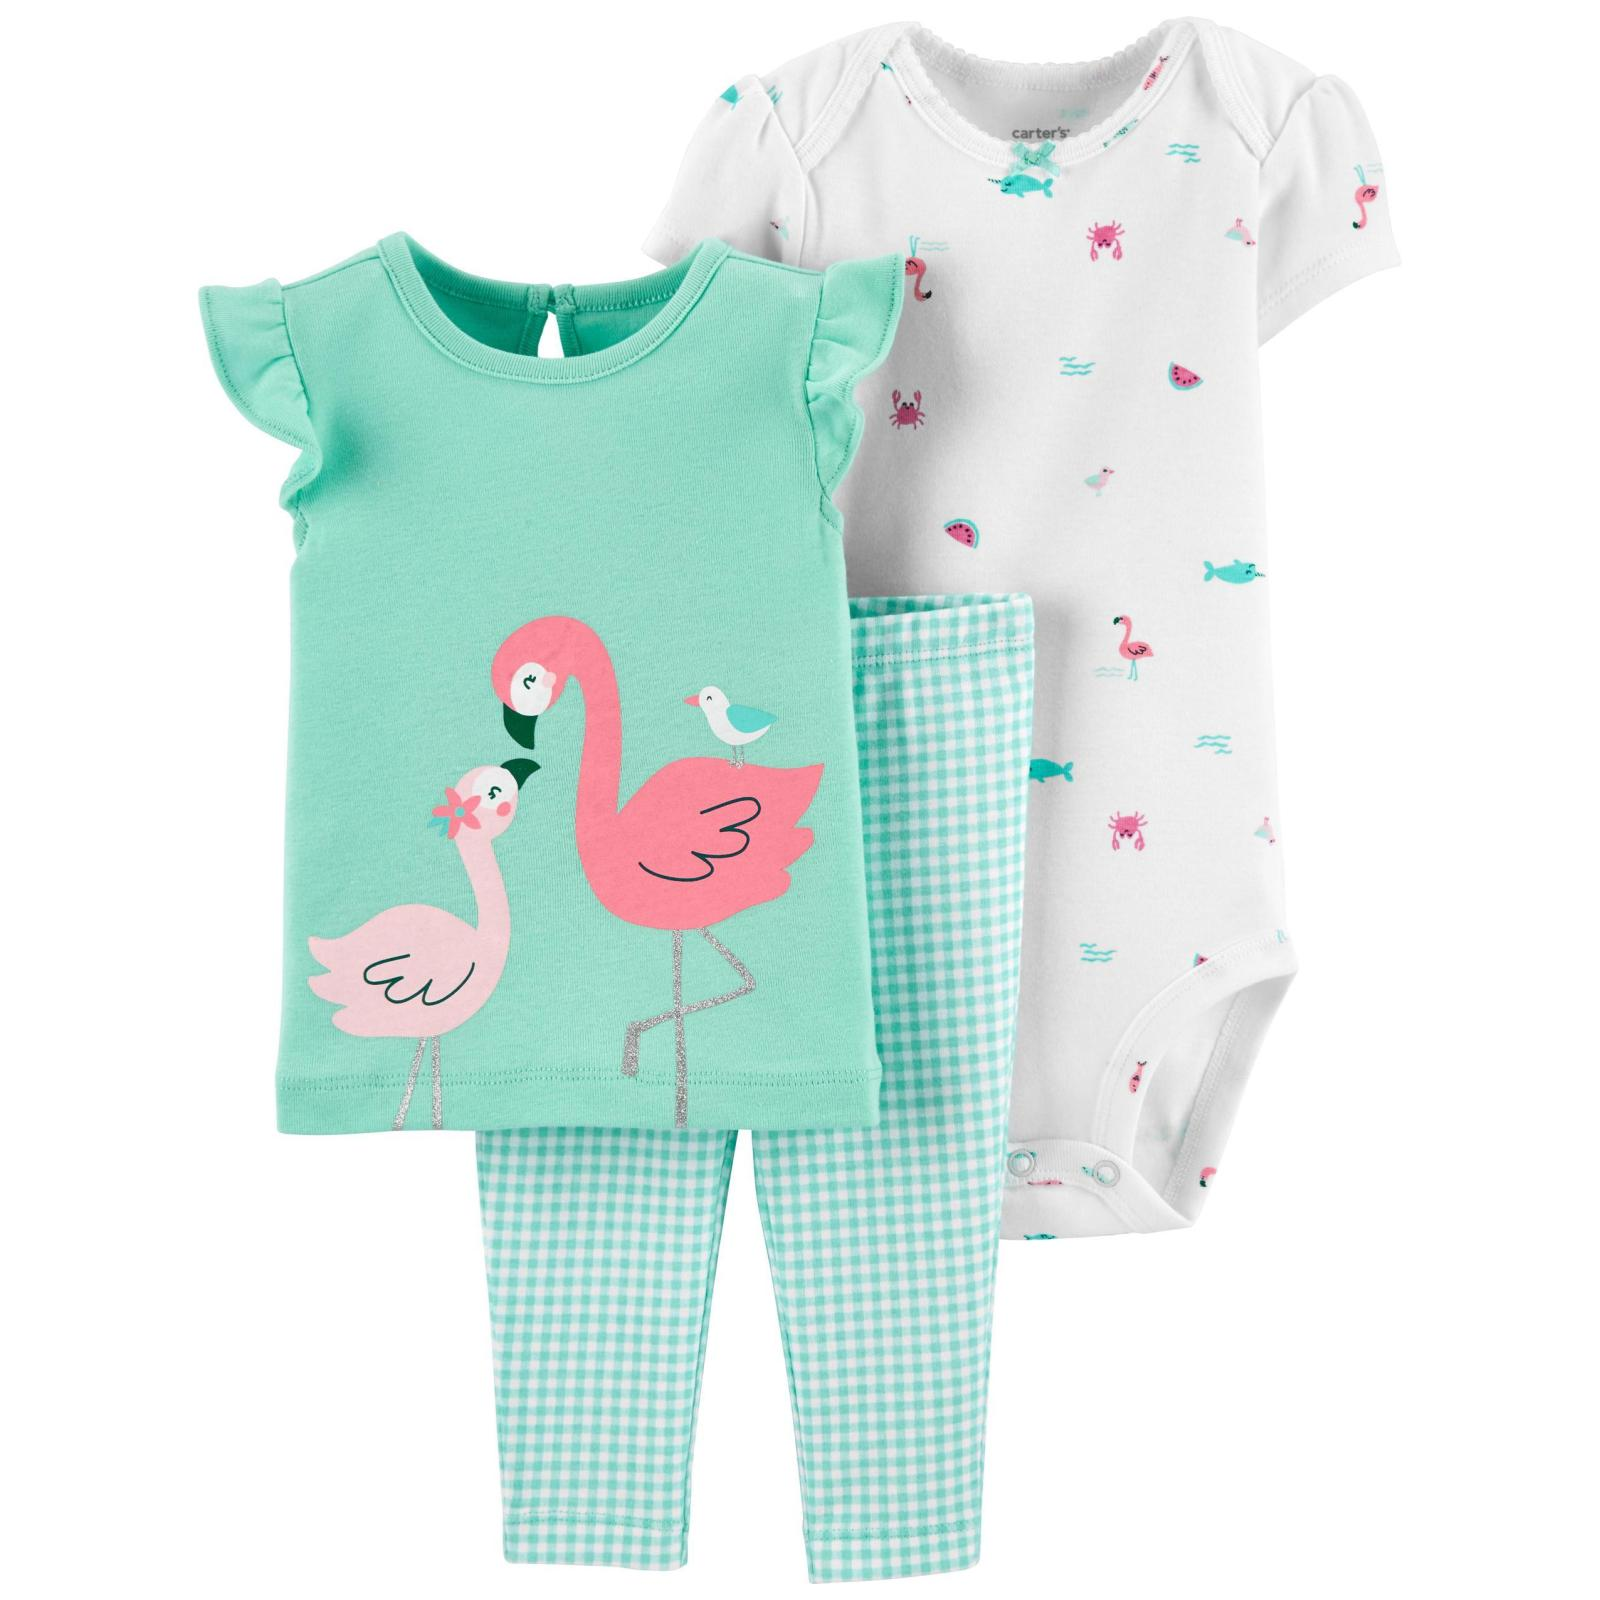 Conjunto 3 pecas verde flamingo